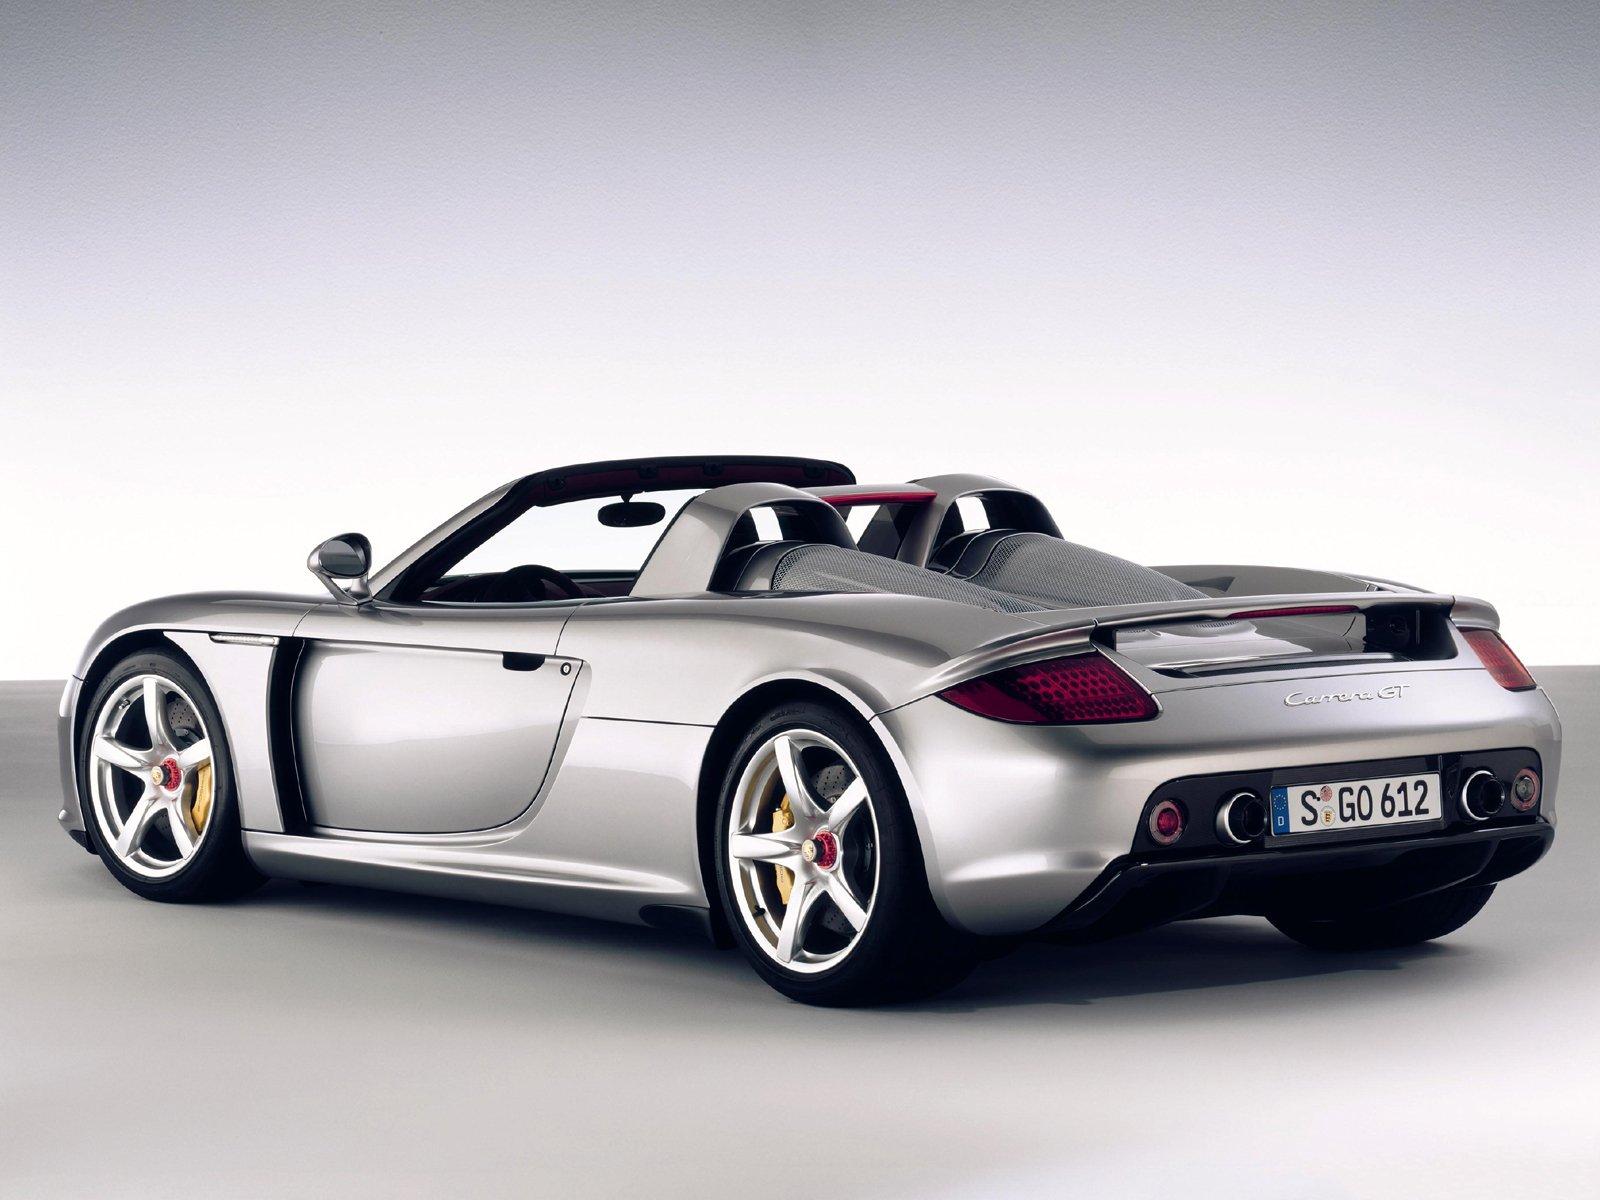 Porsche Carrera gt Price 2013 Porsche Carrera gt